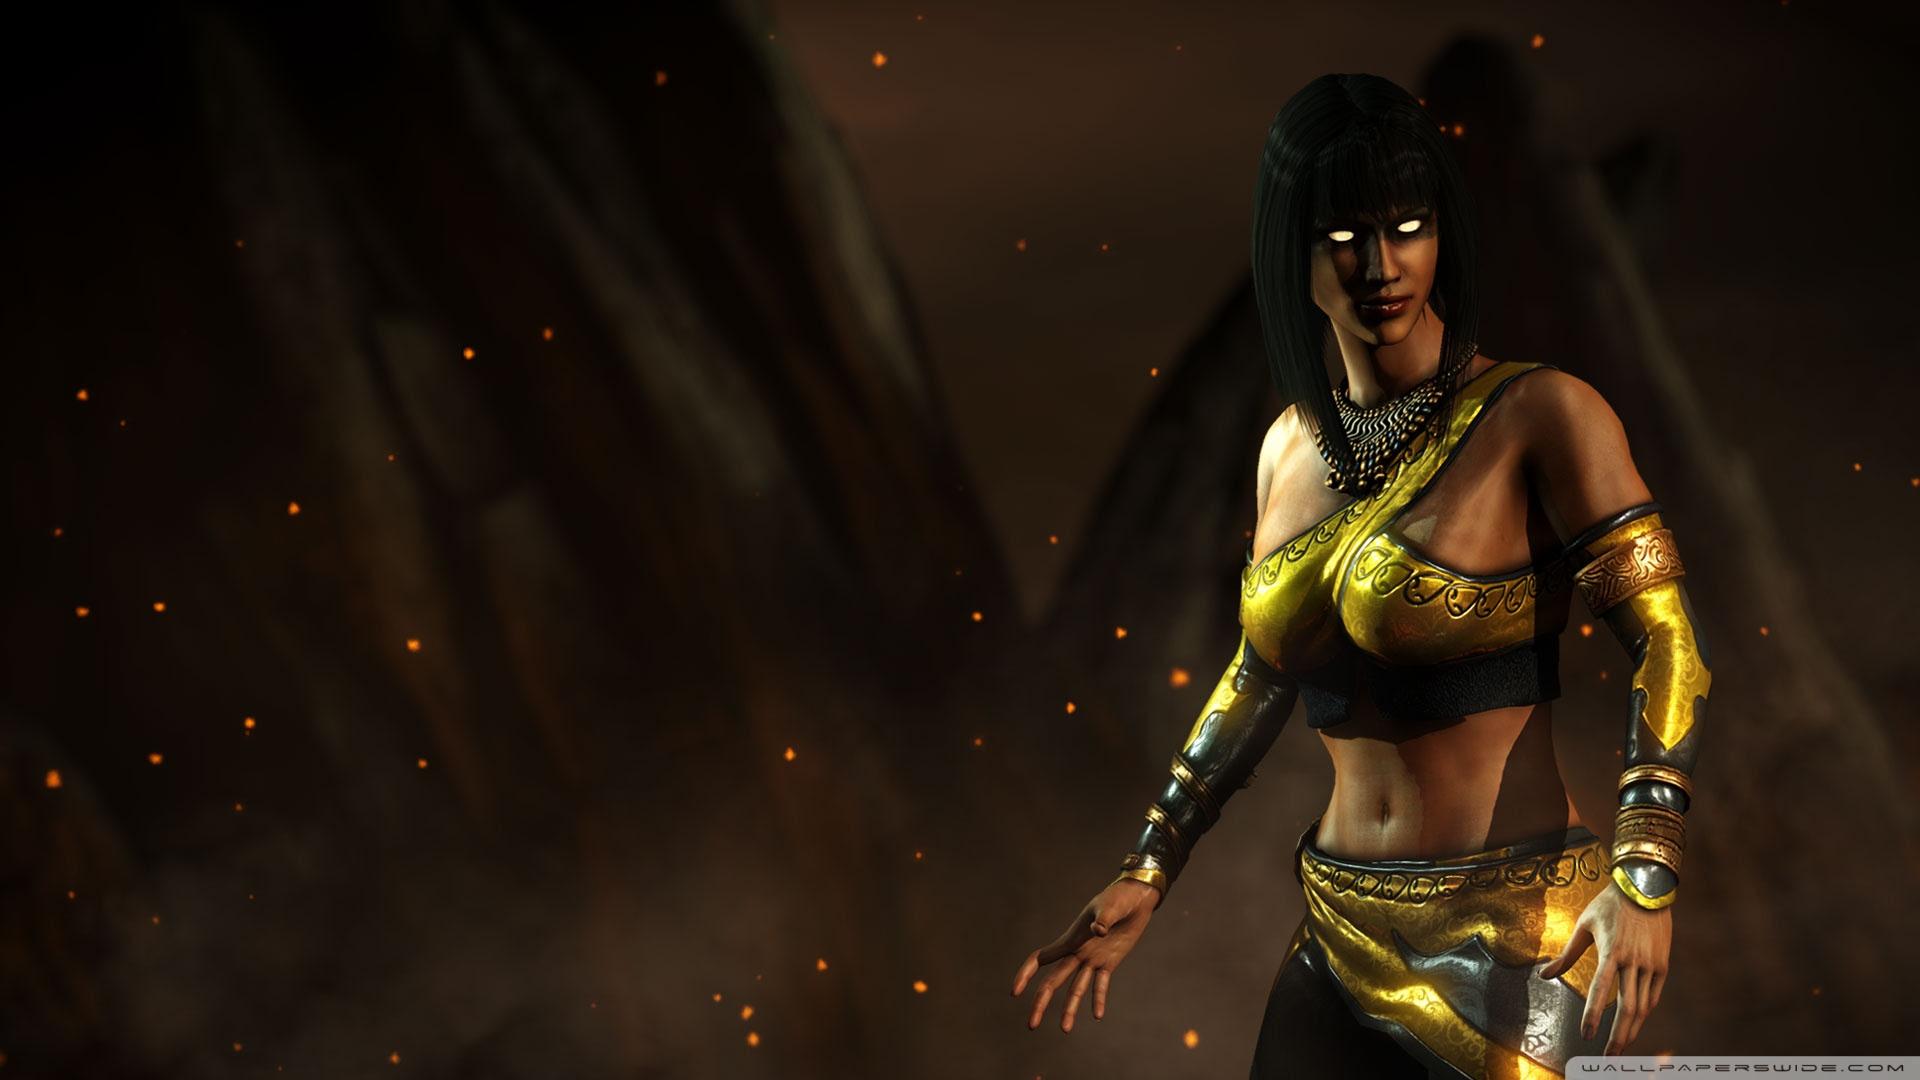 Mortal Kombat X Tanya Ultra Hd Desktop Background Wallpaper For 4k